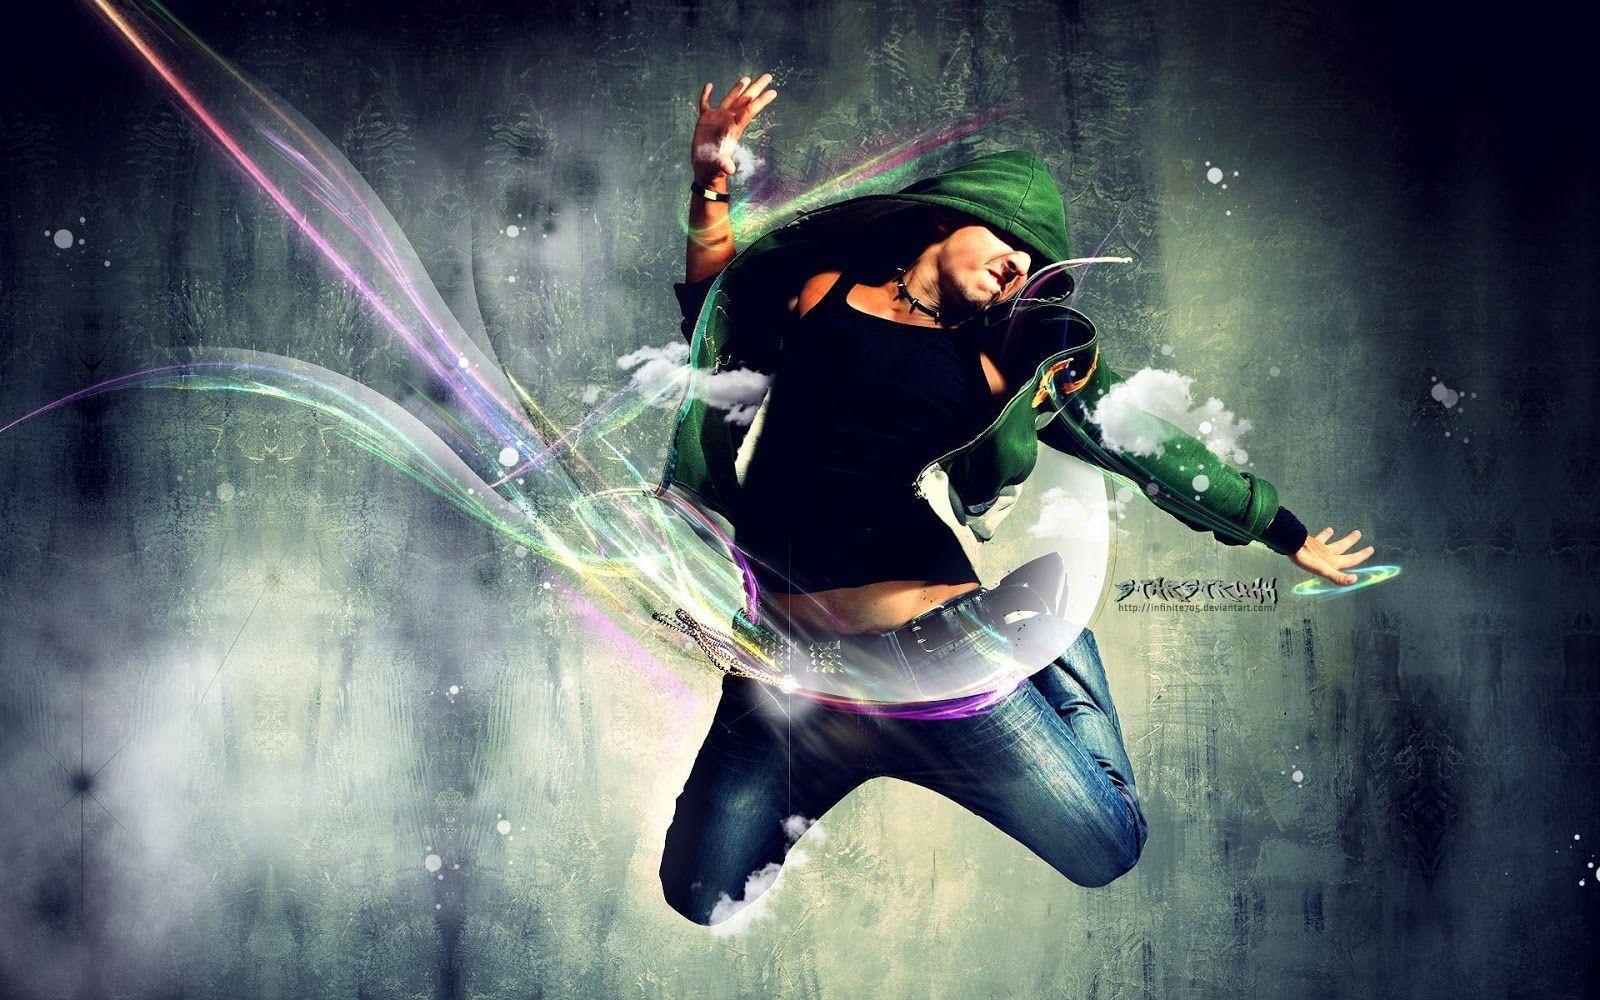 Hip hop dance hd wallpapers wallpaper cave hip hop dance backgrounds wallpaper 1300900 dance backgrounds 49 voltagebd Choice Image